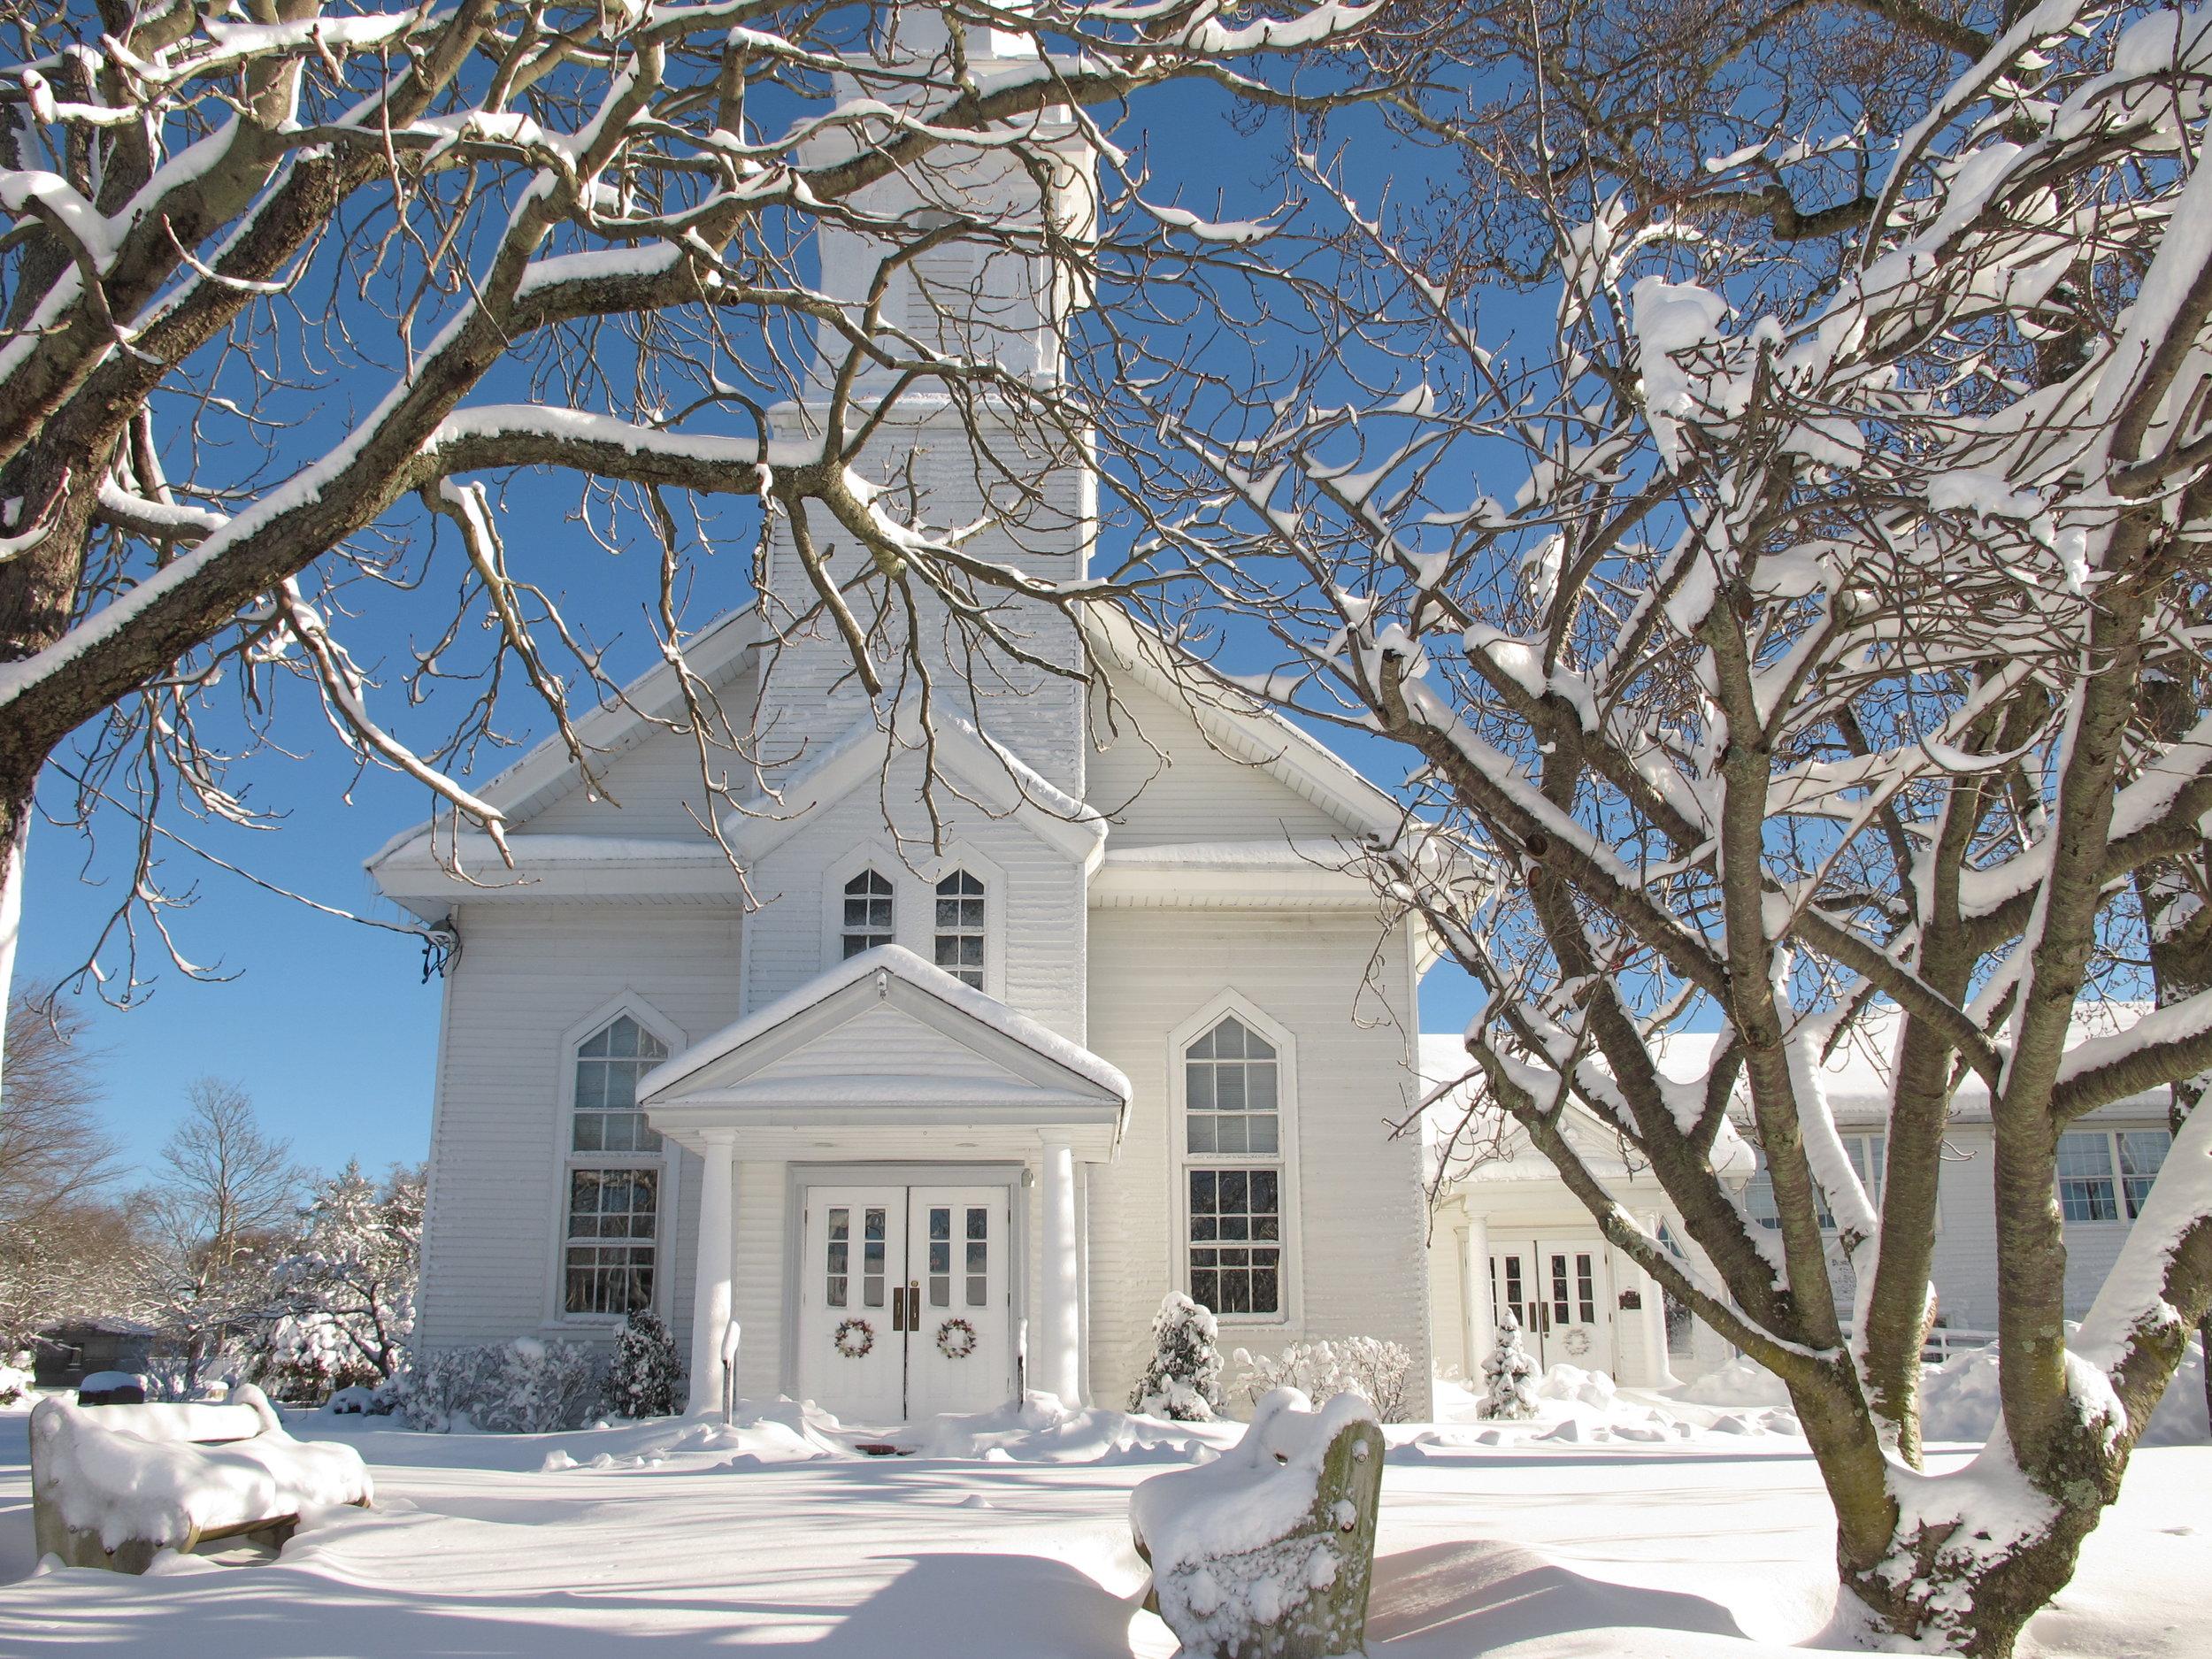 IMG_0788-Church-Winter Scene-Keeper.jpg